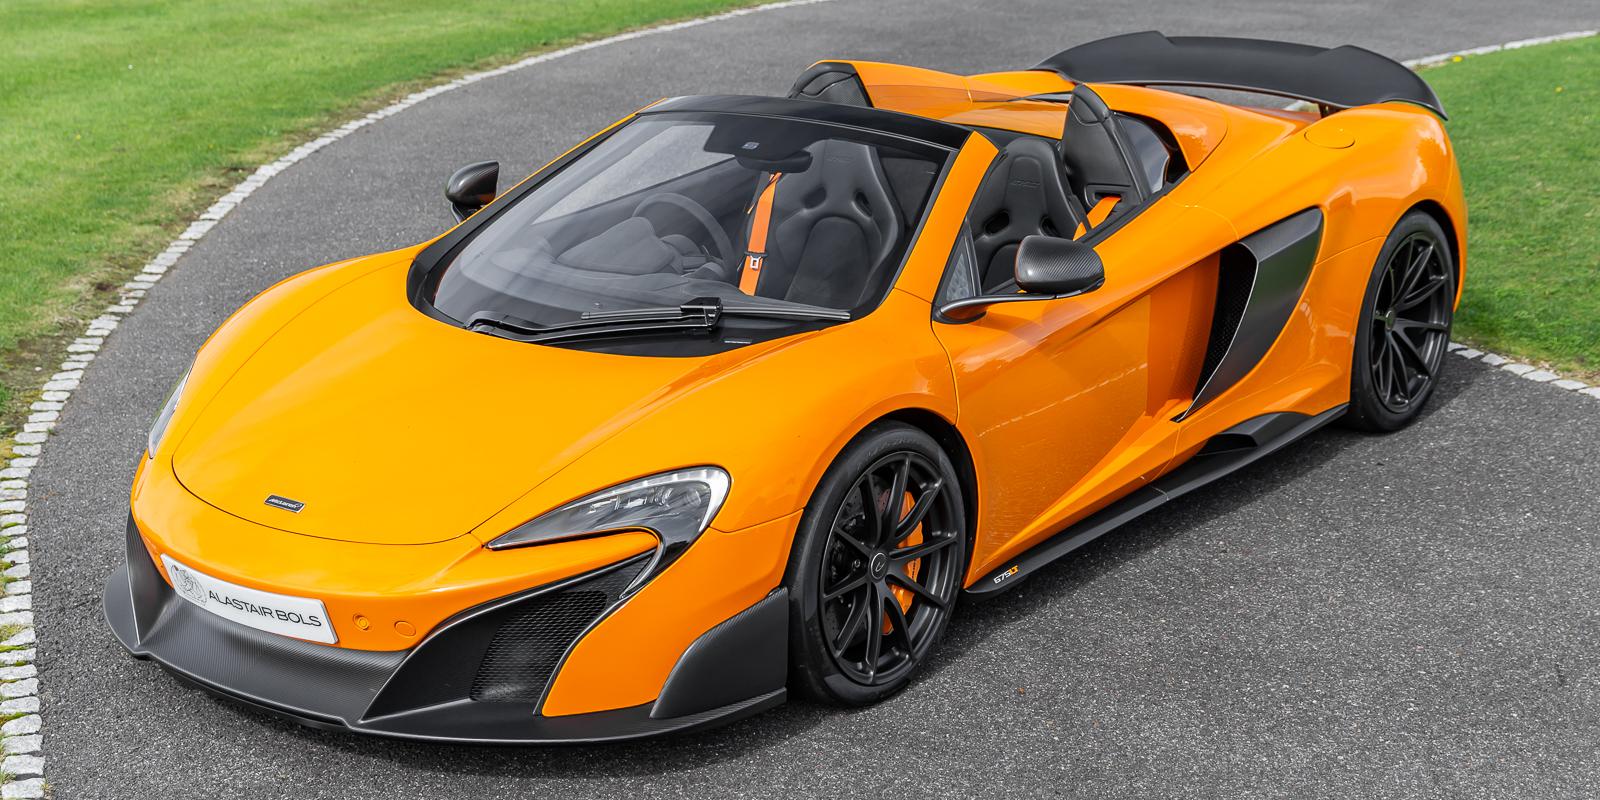 McLaren 675LT Spider – McLaren orange